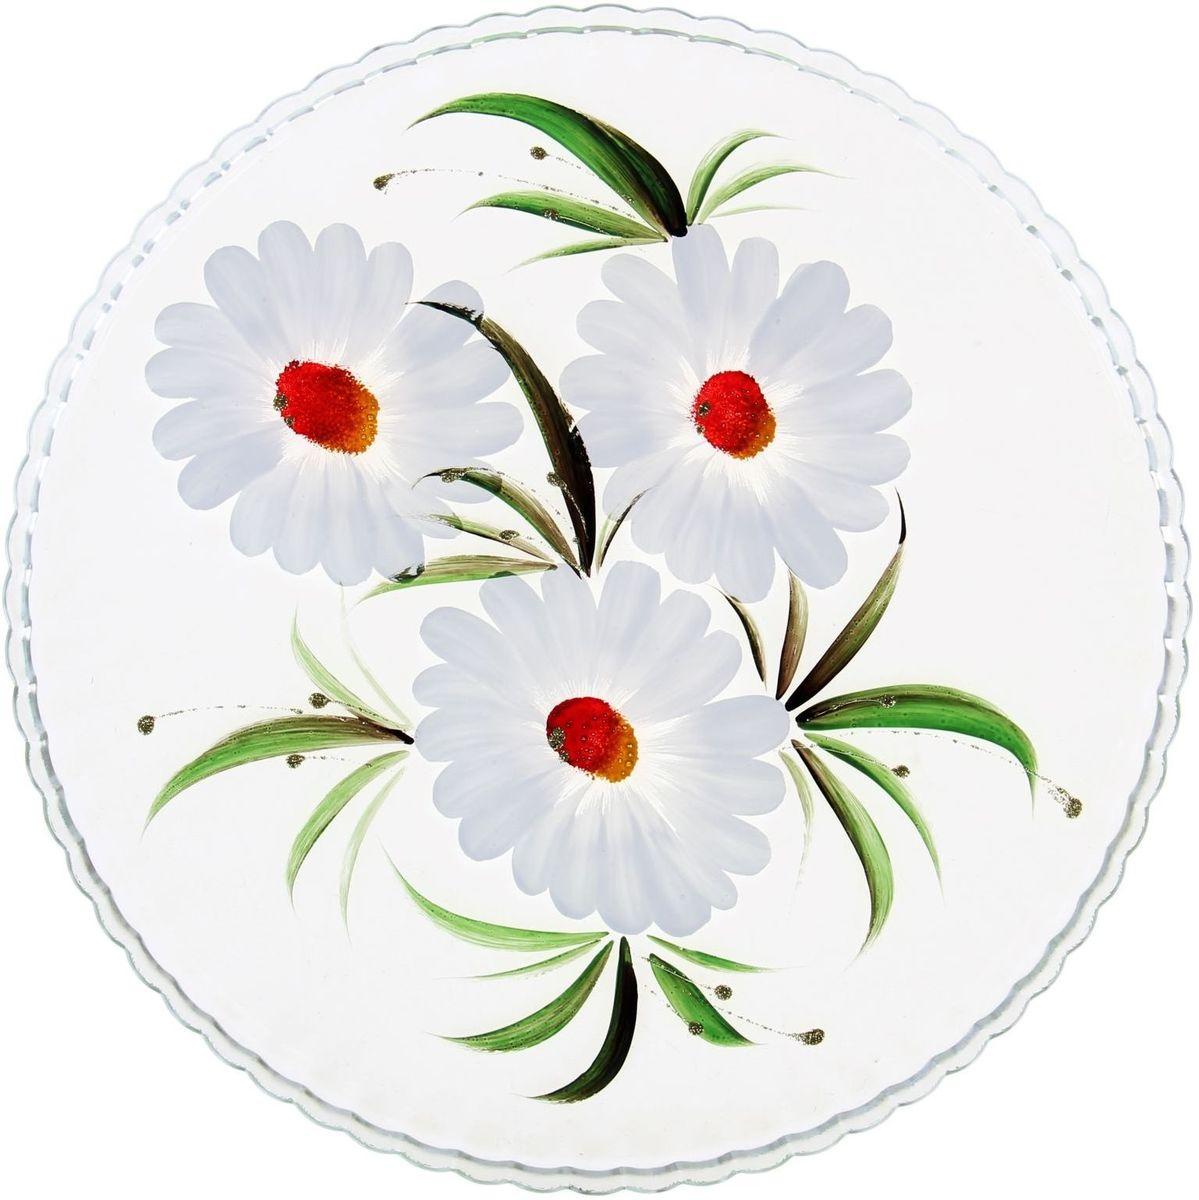 Блюдо Хрустальный звон Патиссэри, диаметр 28 см. 1193699 блюдо churchill диаметр 28 5 см